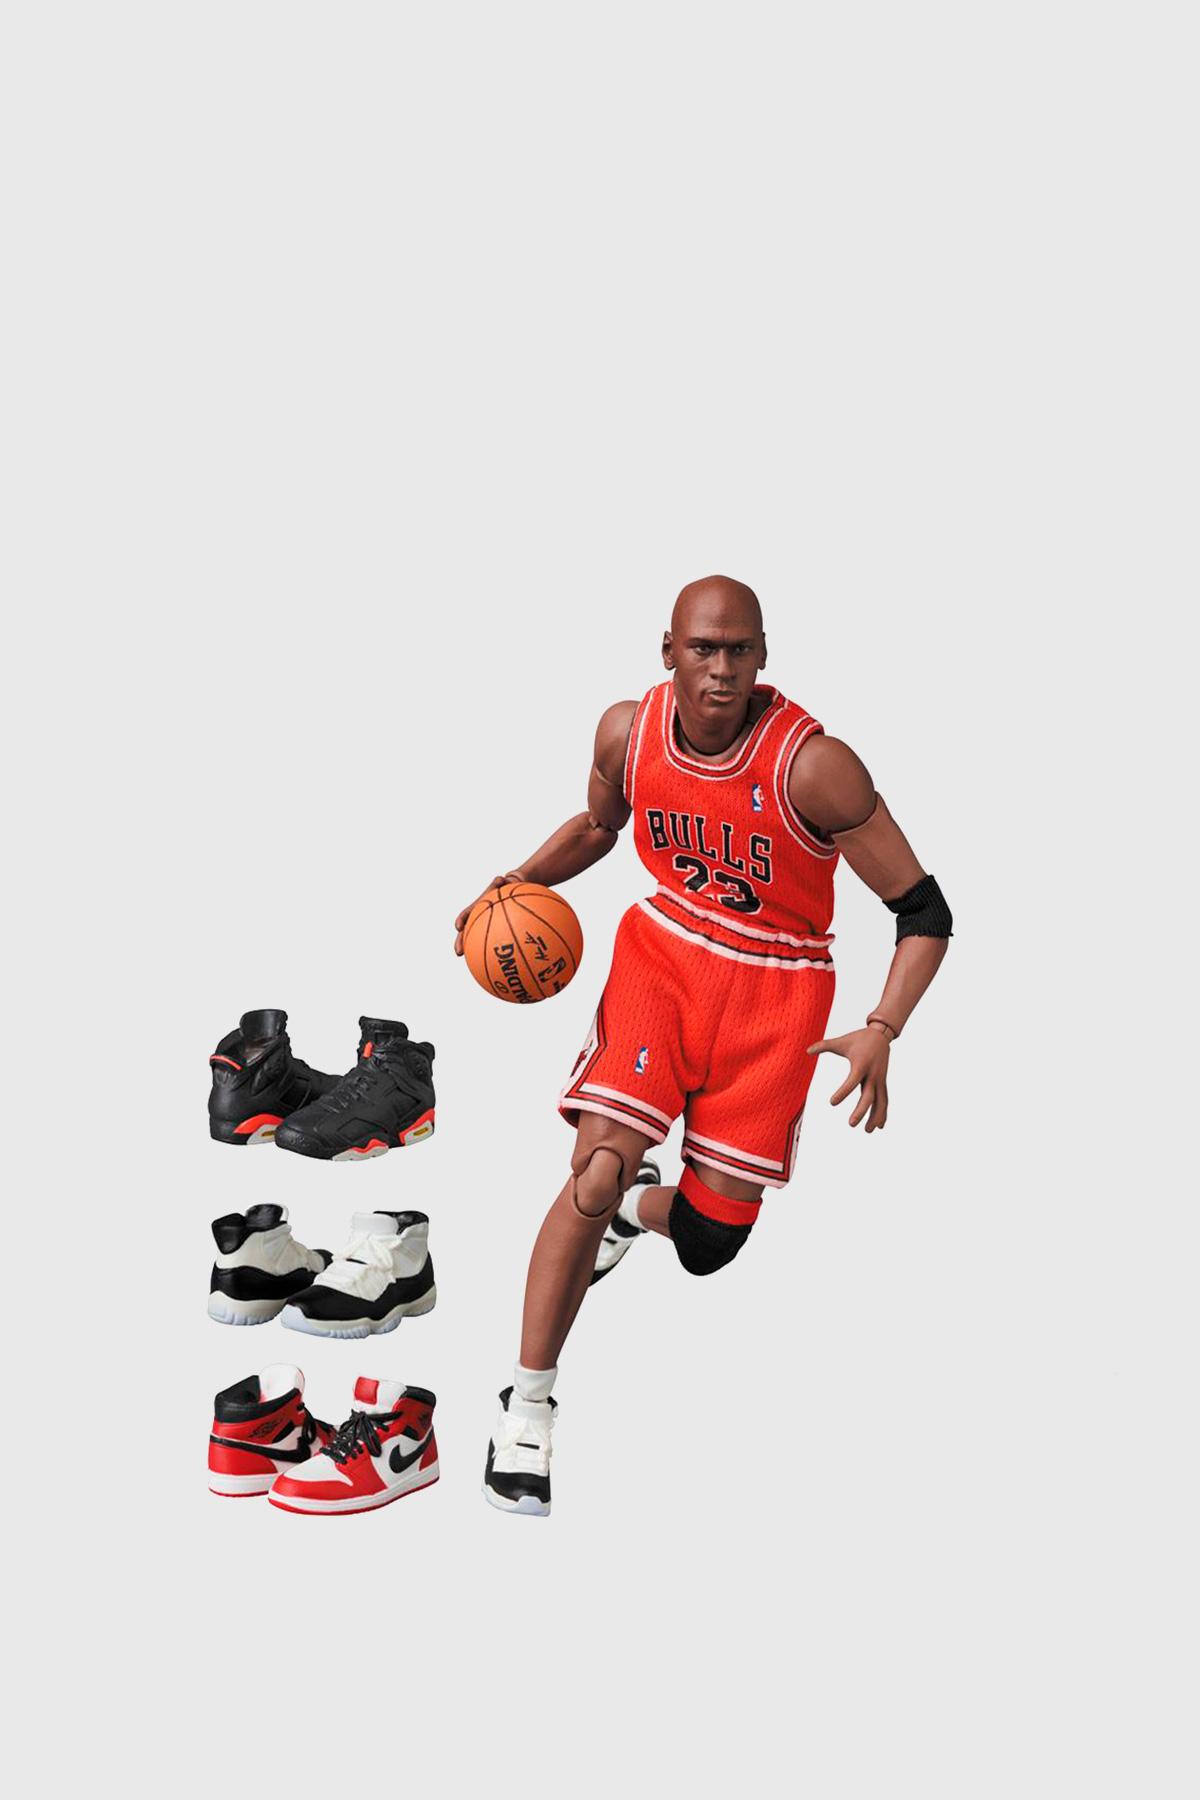 Viaje Lograr Shetland  Wood Wood - Mafex Michael Jordan - Chicago Bulls